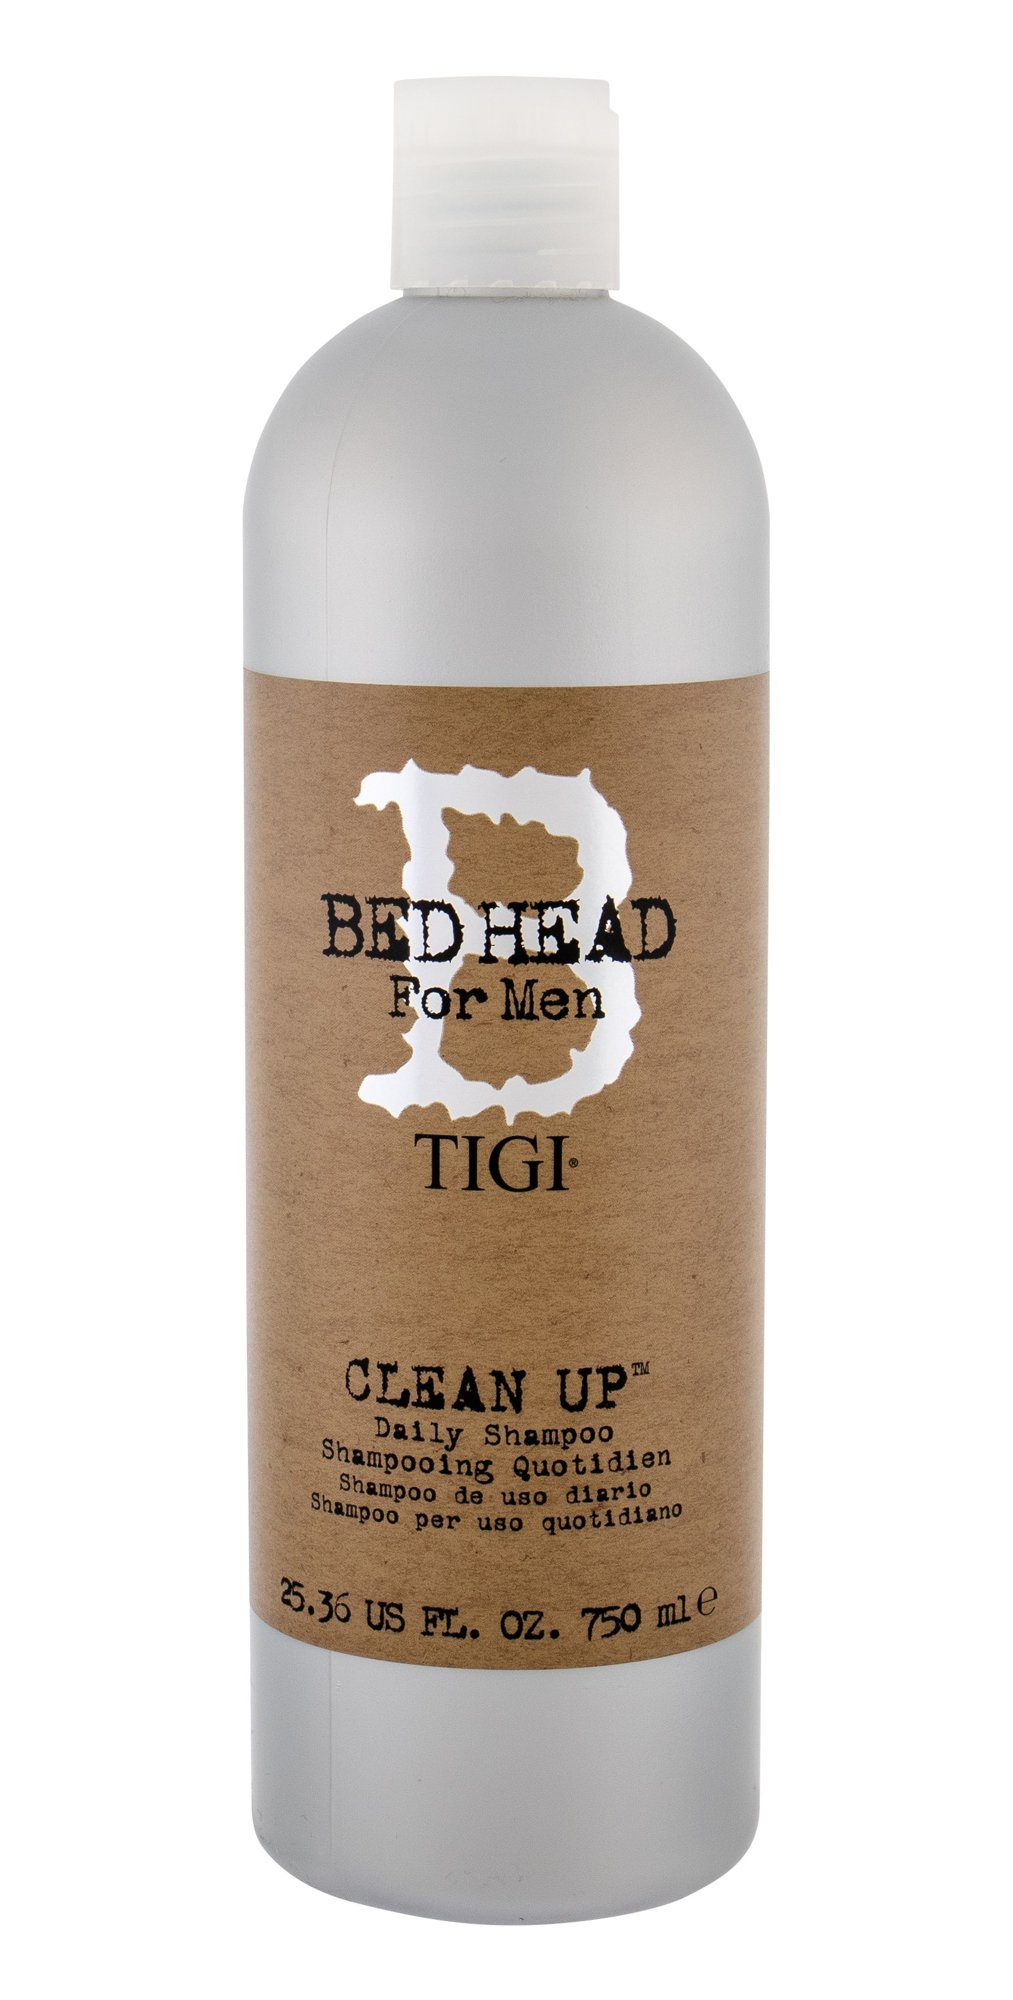 Tigi Bed Head Men Shampoo 750ml